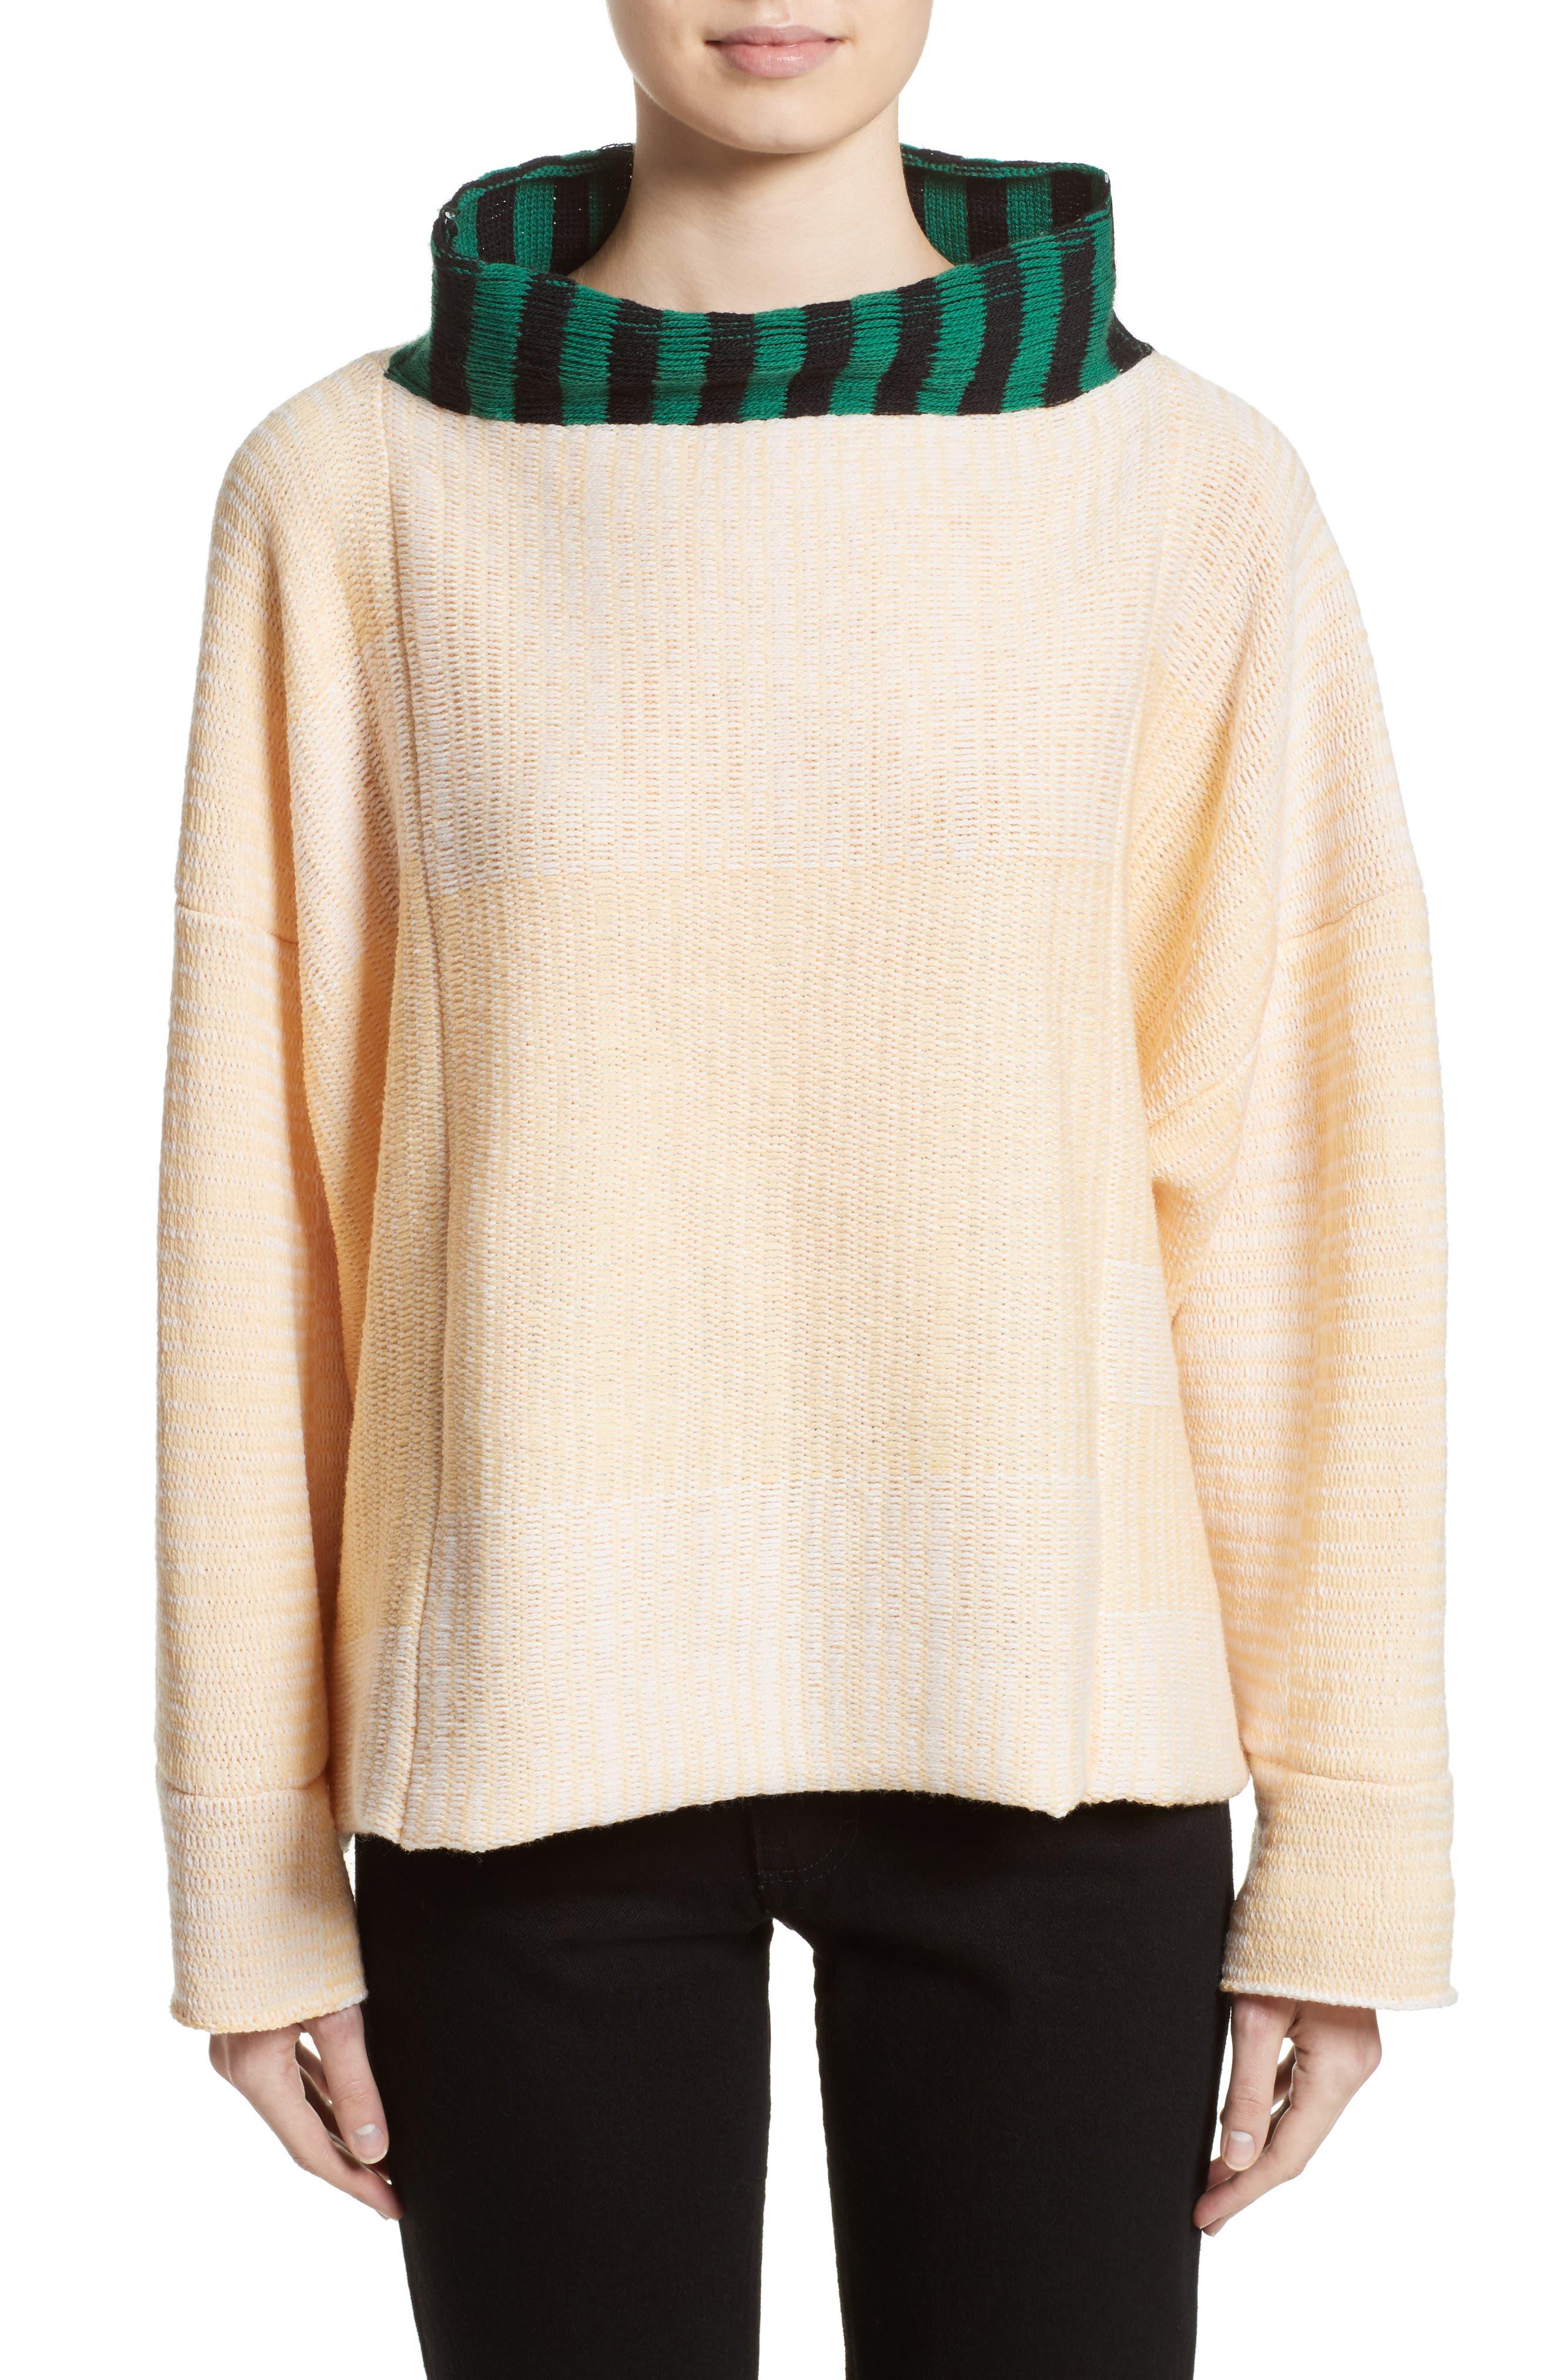 Alternate Image 1 Selected - Eckhaus Latta Vented Dolman Sweater